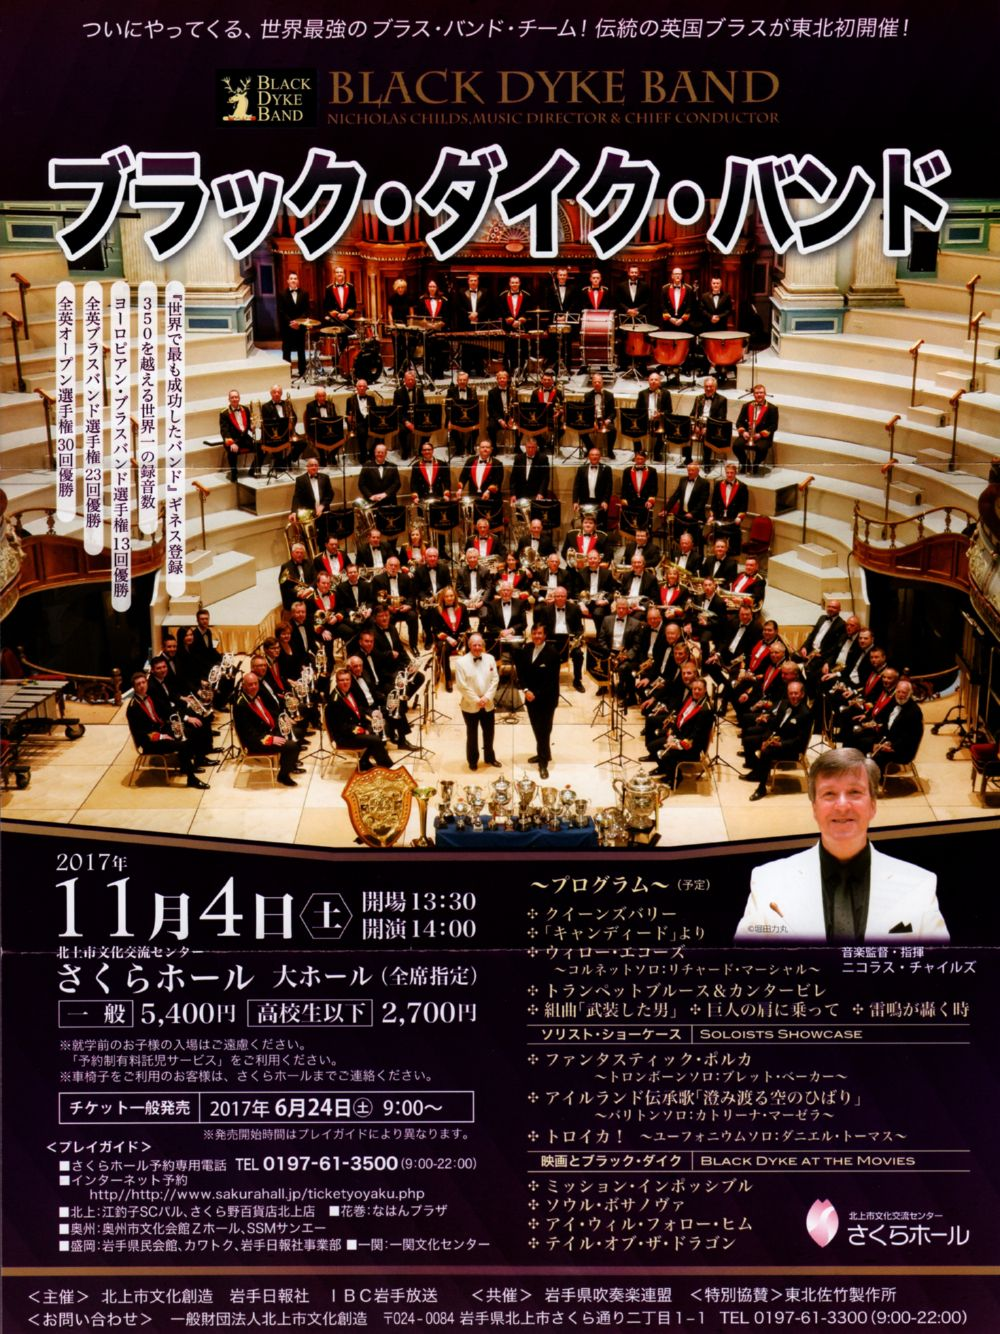 Black Dyke Band 2017 Japan Tour in Kitakami | 音楽雑記帳+